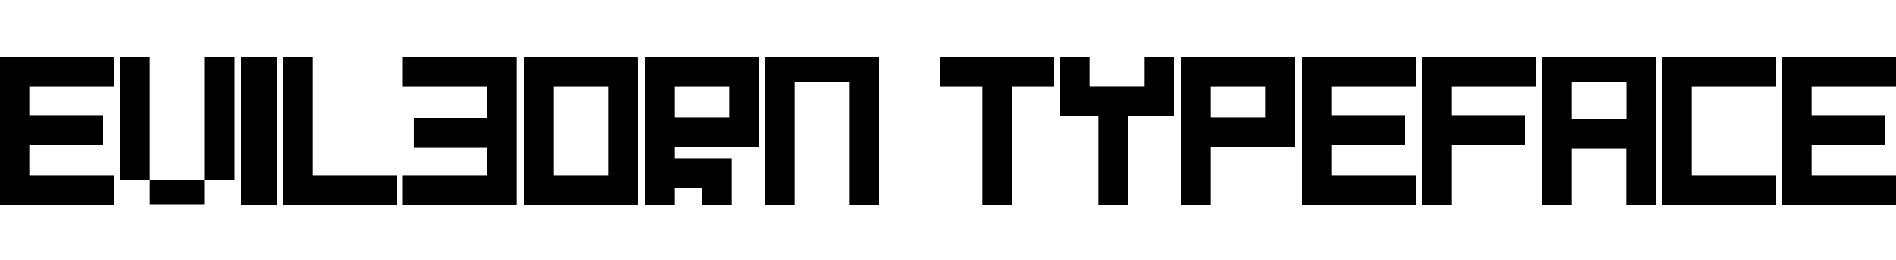 Evilborn Typeface